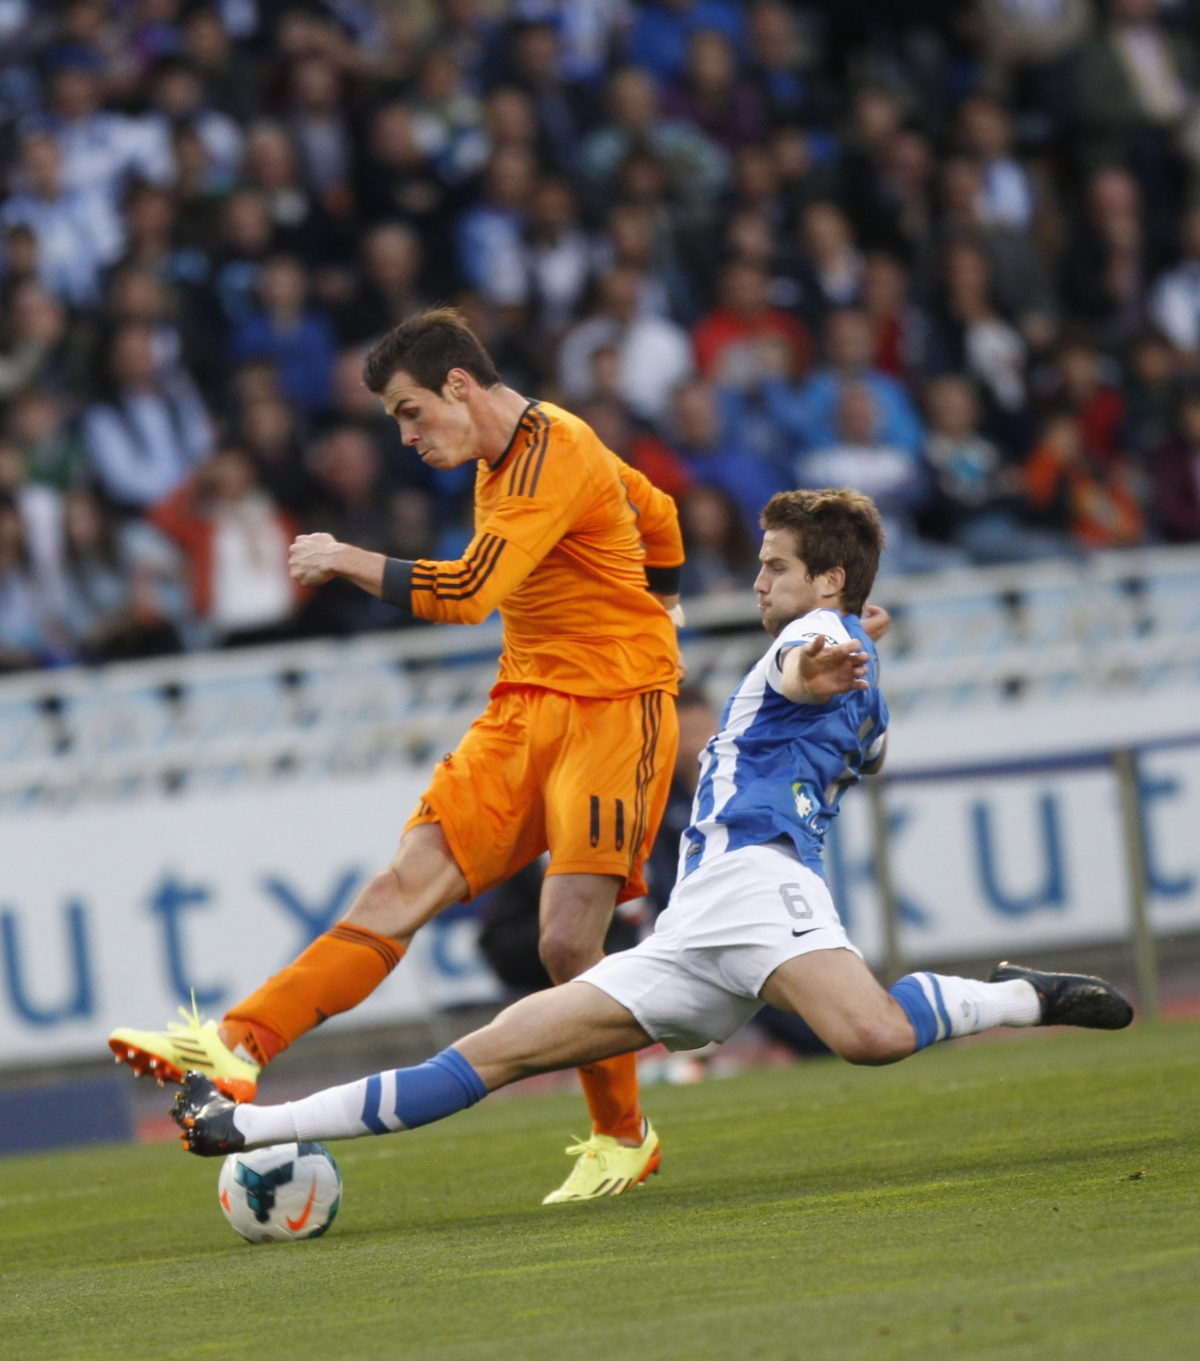 Real Madrid's Gareth Bale fights for the ball with Real Sociedad's Inigo Martinez during their La Liga soccer match at Anoeta stadium in San Sebastian April 5, 2014